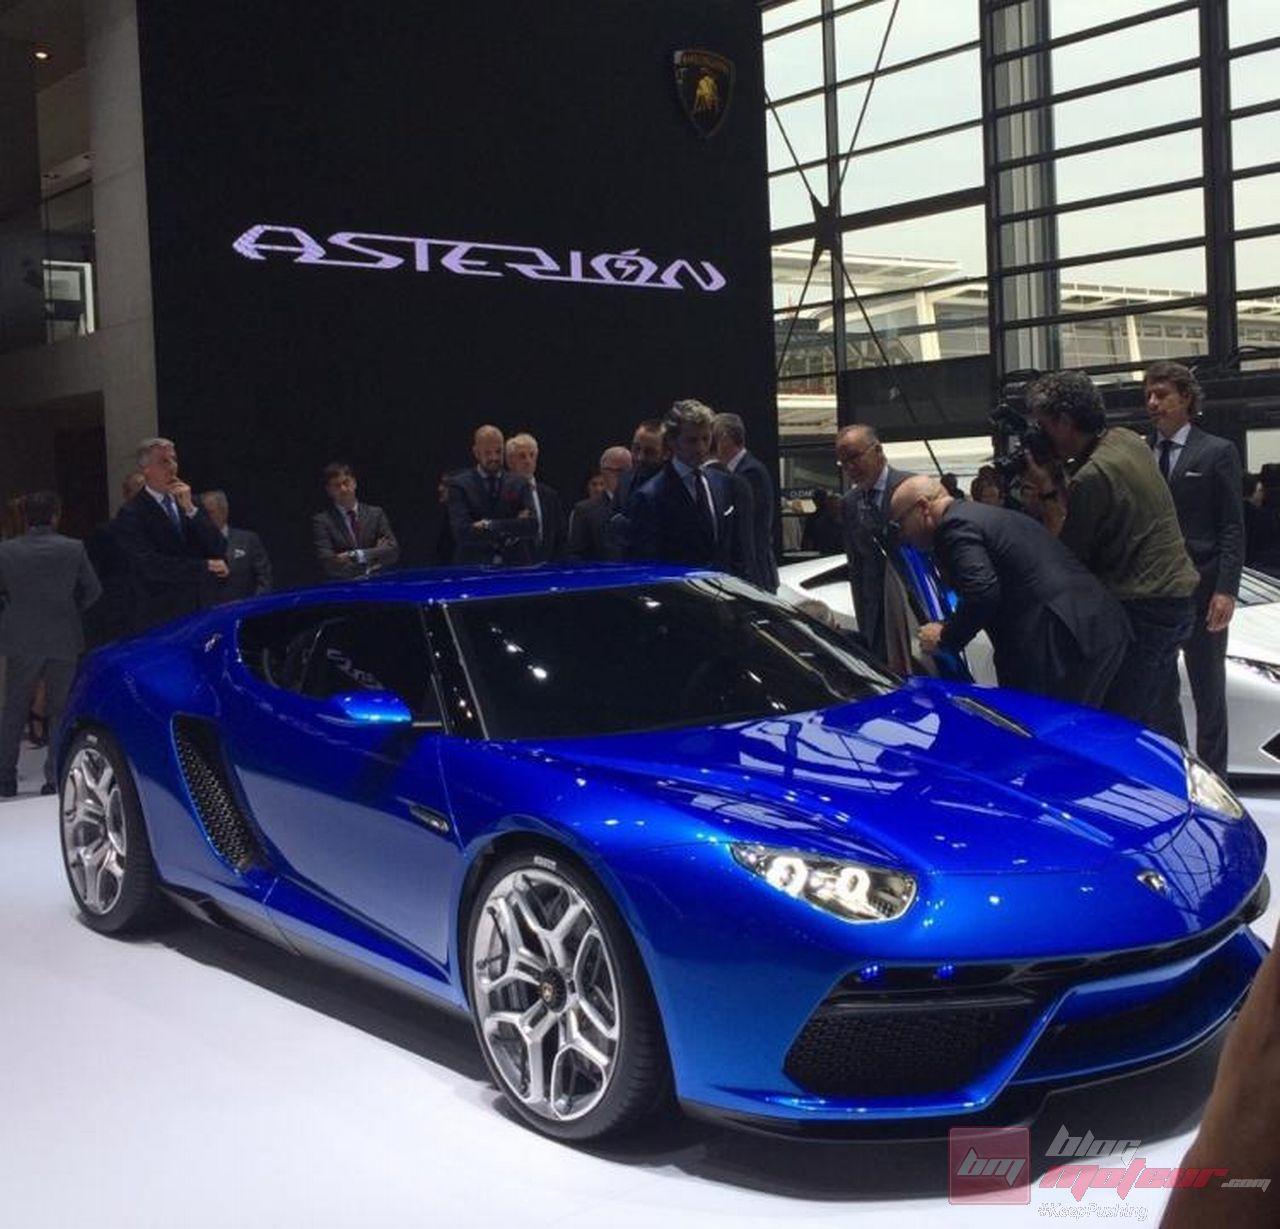 Lamborghini Asterion: Paris 2014 : Lamborghini Asterion LPI 910-4 : Une Hypercar